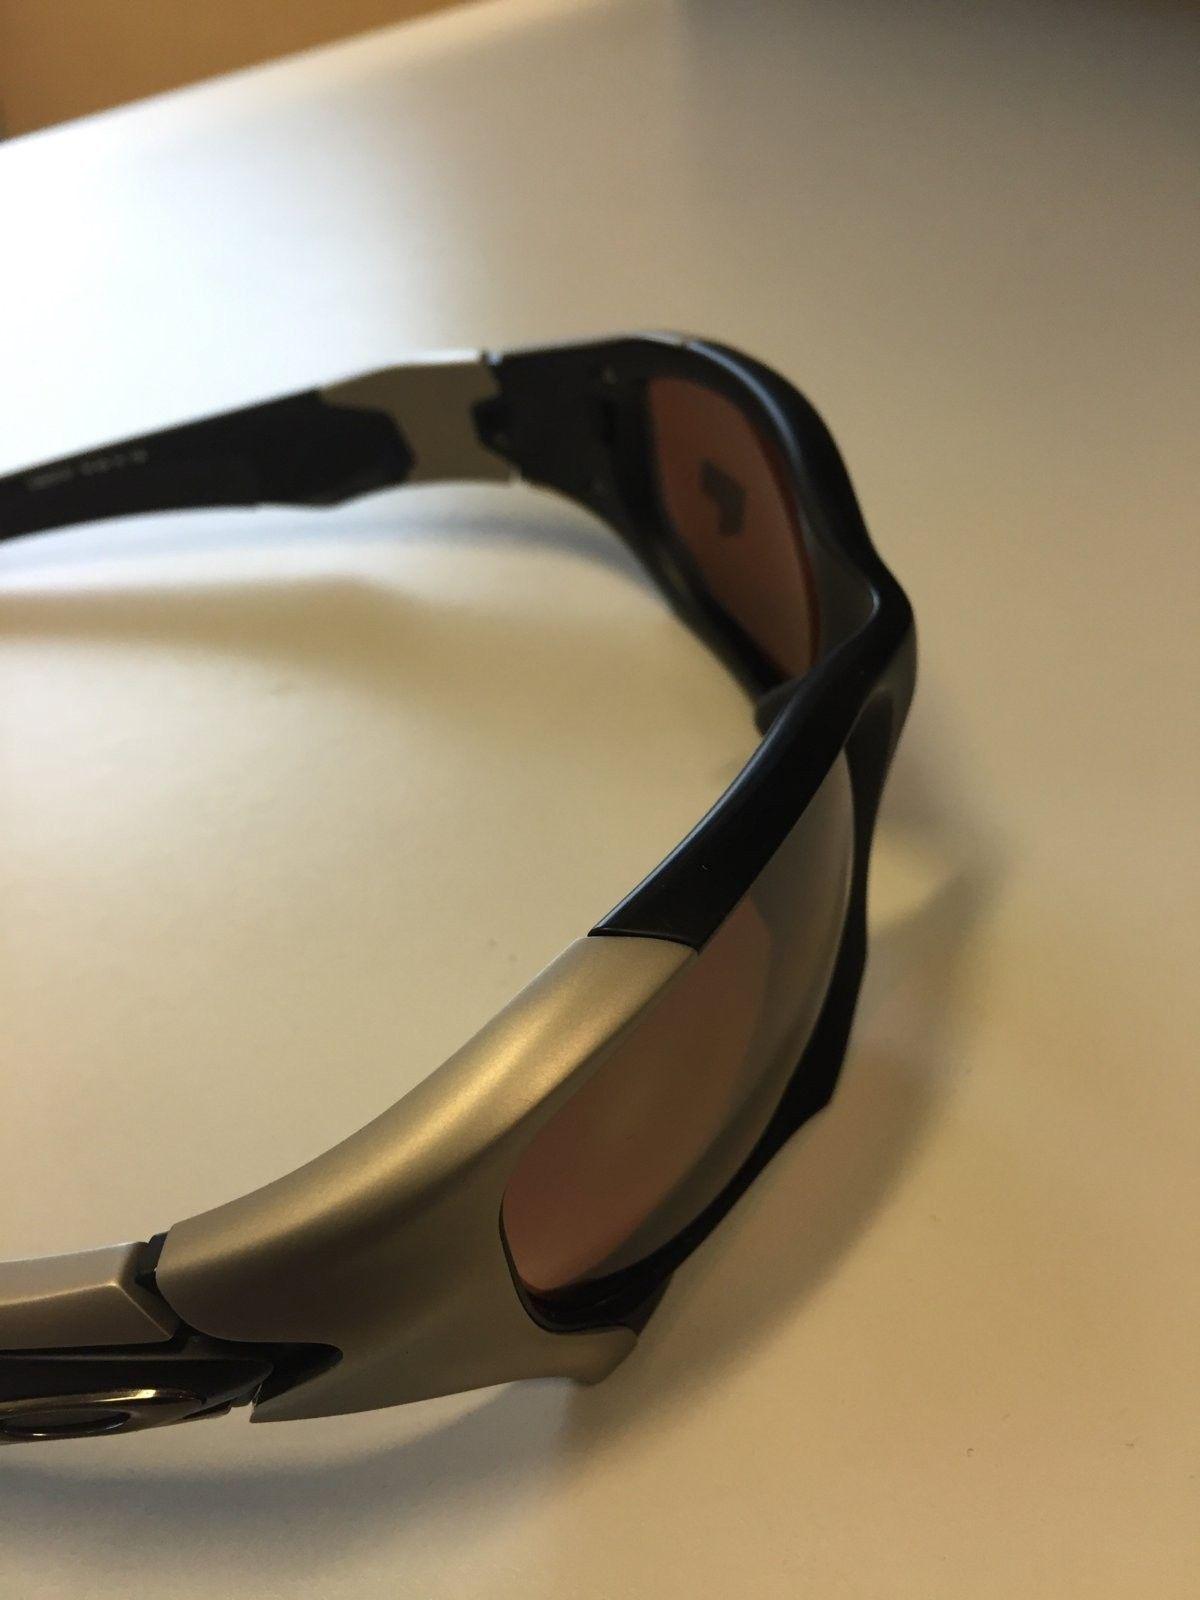 Perfect Oakley Pit Boss 2 Matte black VR28 BI Polarized $250 All In - image.jpg